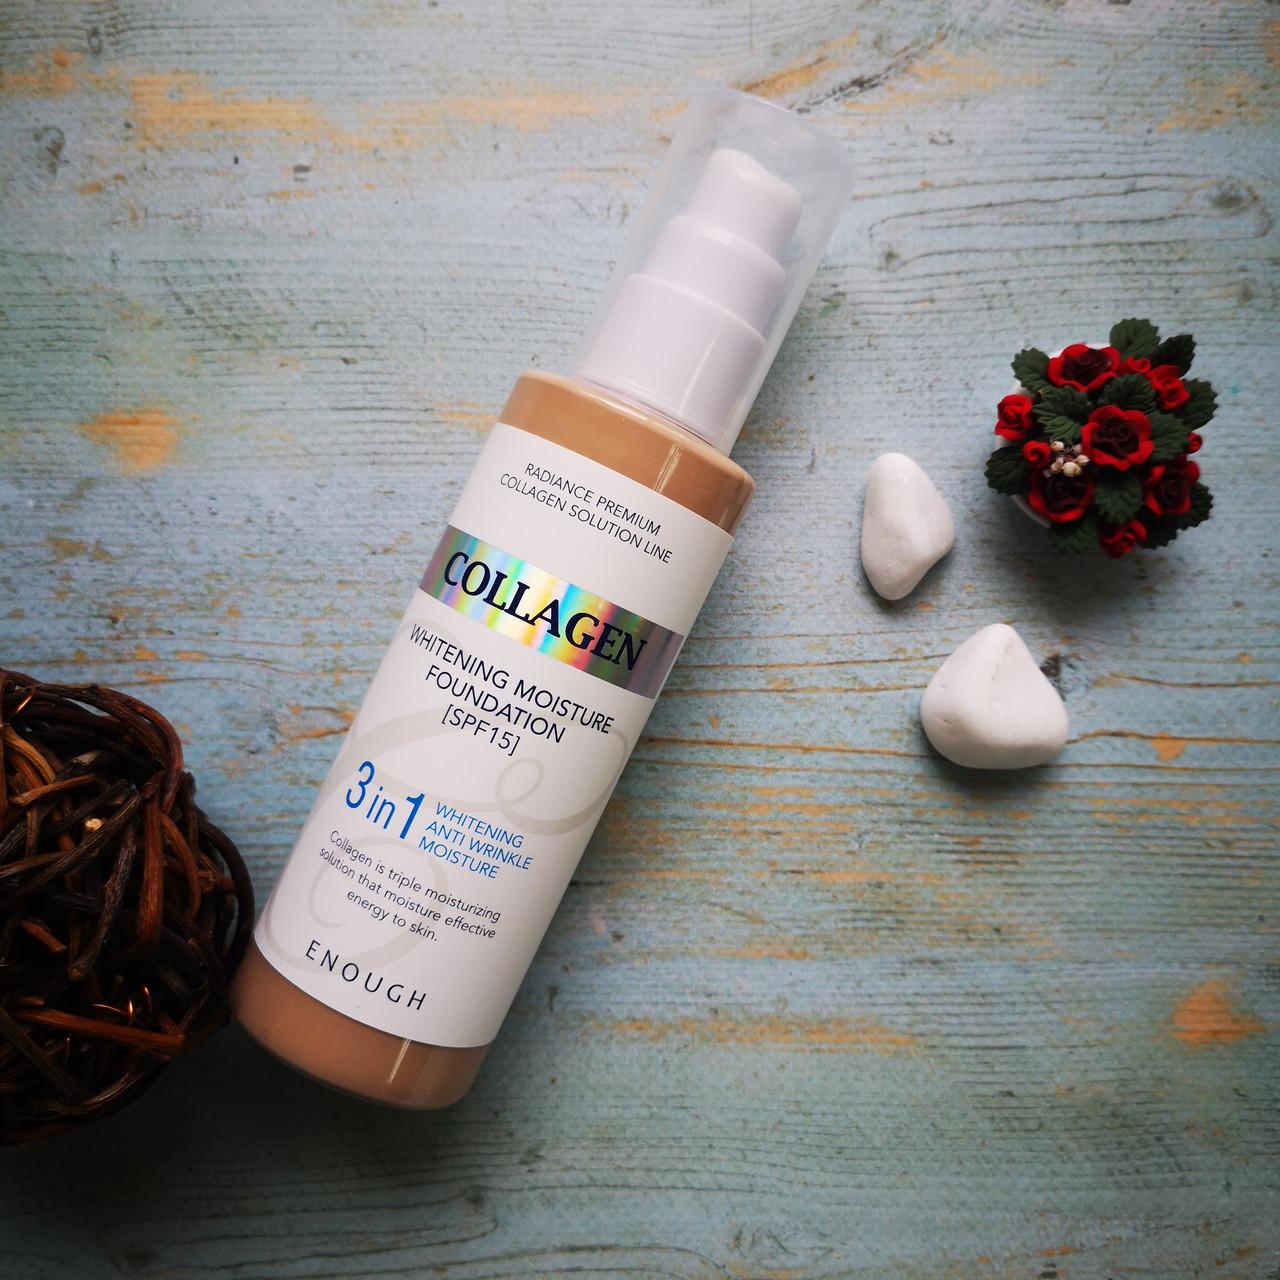 Осветляющая база под макияж Enough с колагеном Collagen Whitening Moisture Foundation 3 in 1 #21